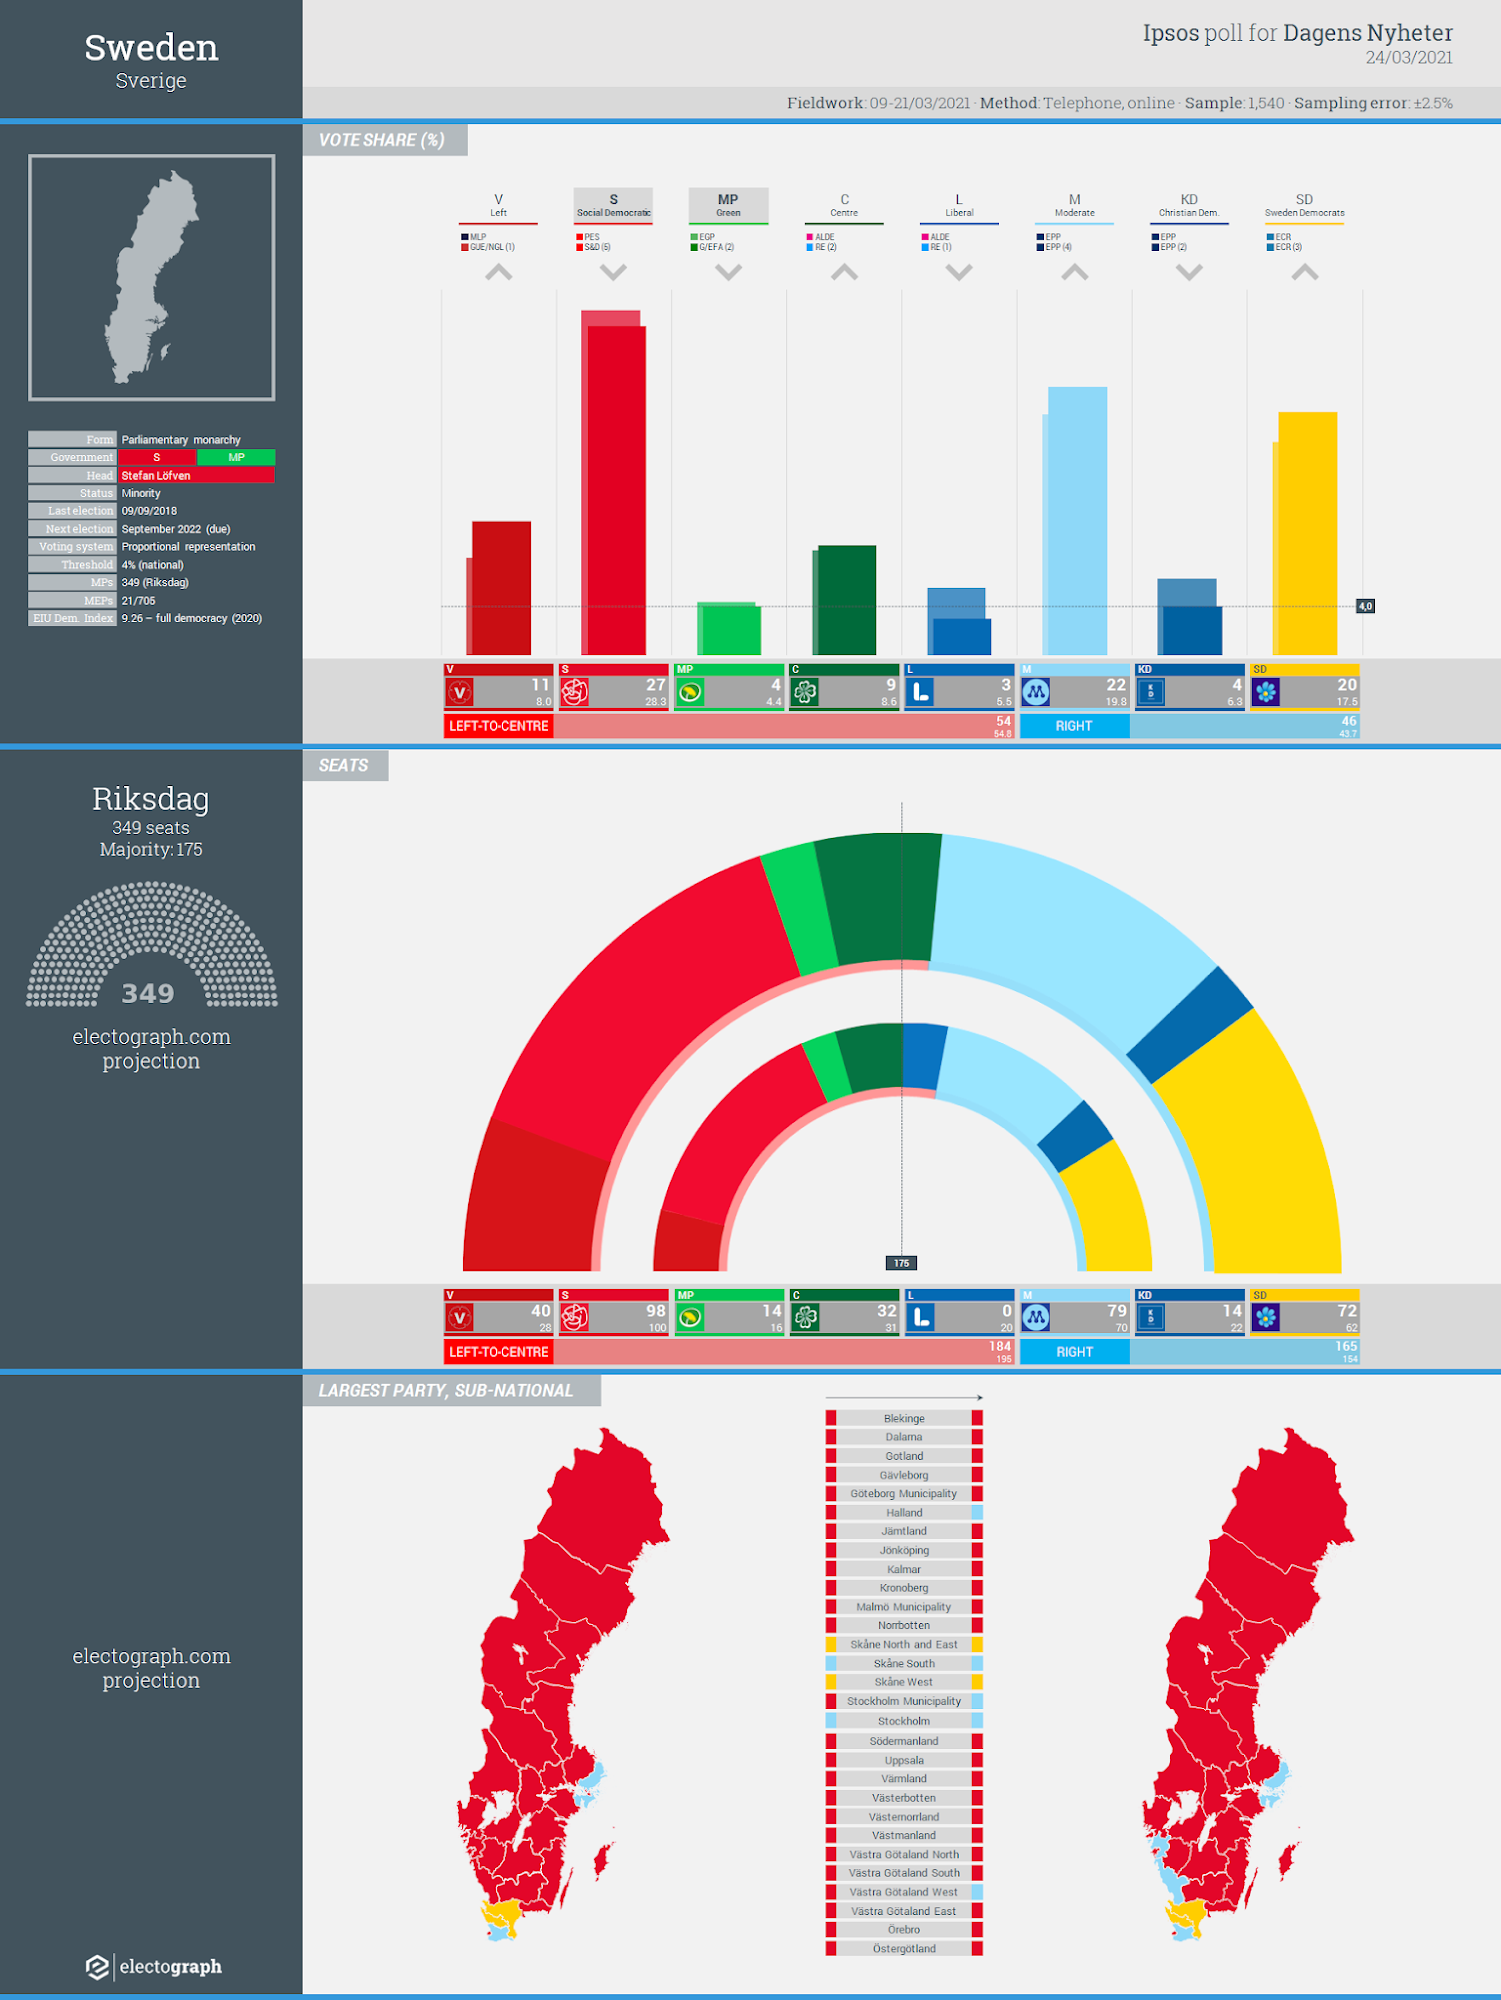 SWEDEN: Ipsos poll chart for Dagens Nyheter, 24 March 2021